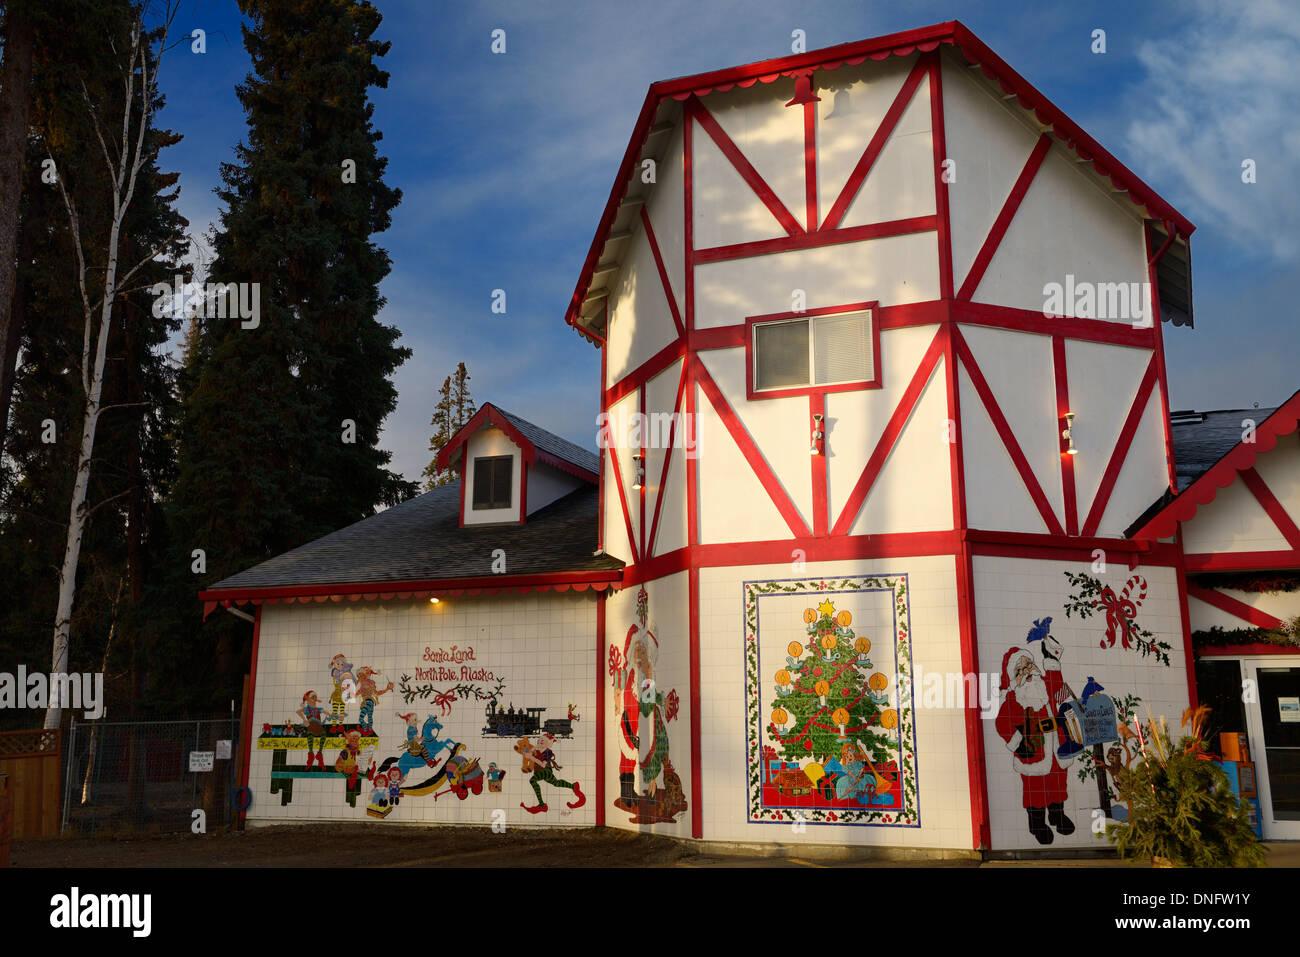 The Santa Claus House at SantaLand North Pole Alaska USA with Christmas scene tiles - Stock Image